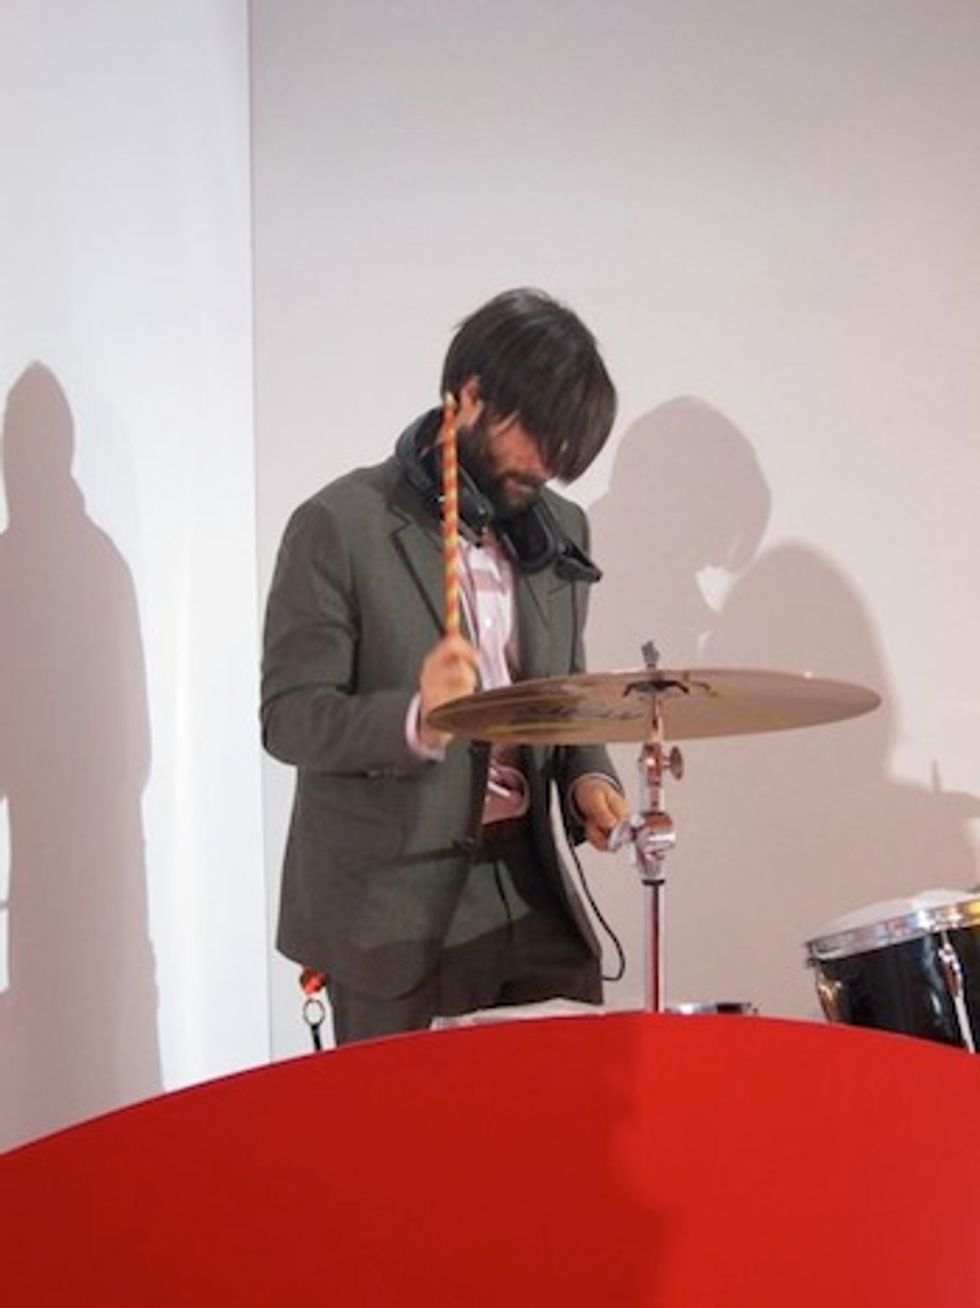 Jason Schwartzman Plays Drums at the Kenzo Paris Fashion Week Show